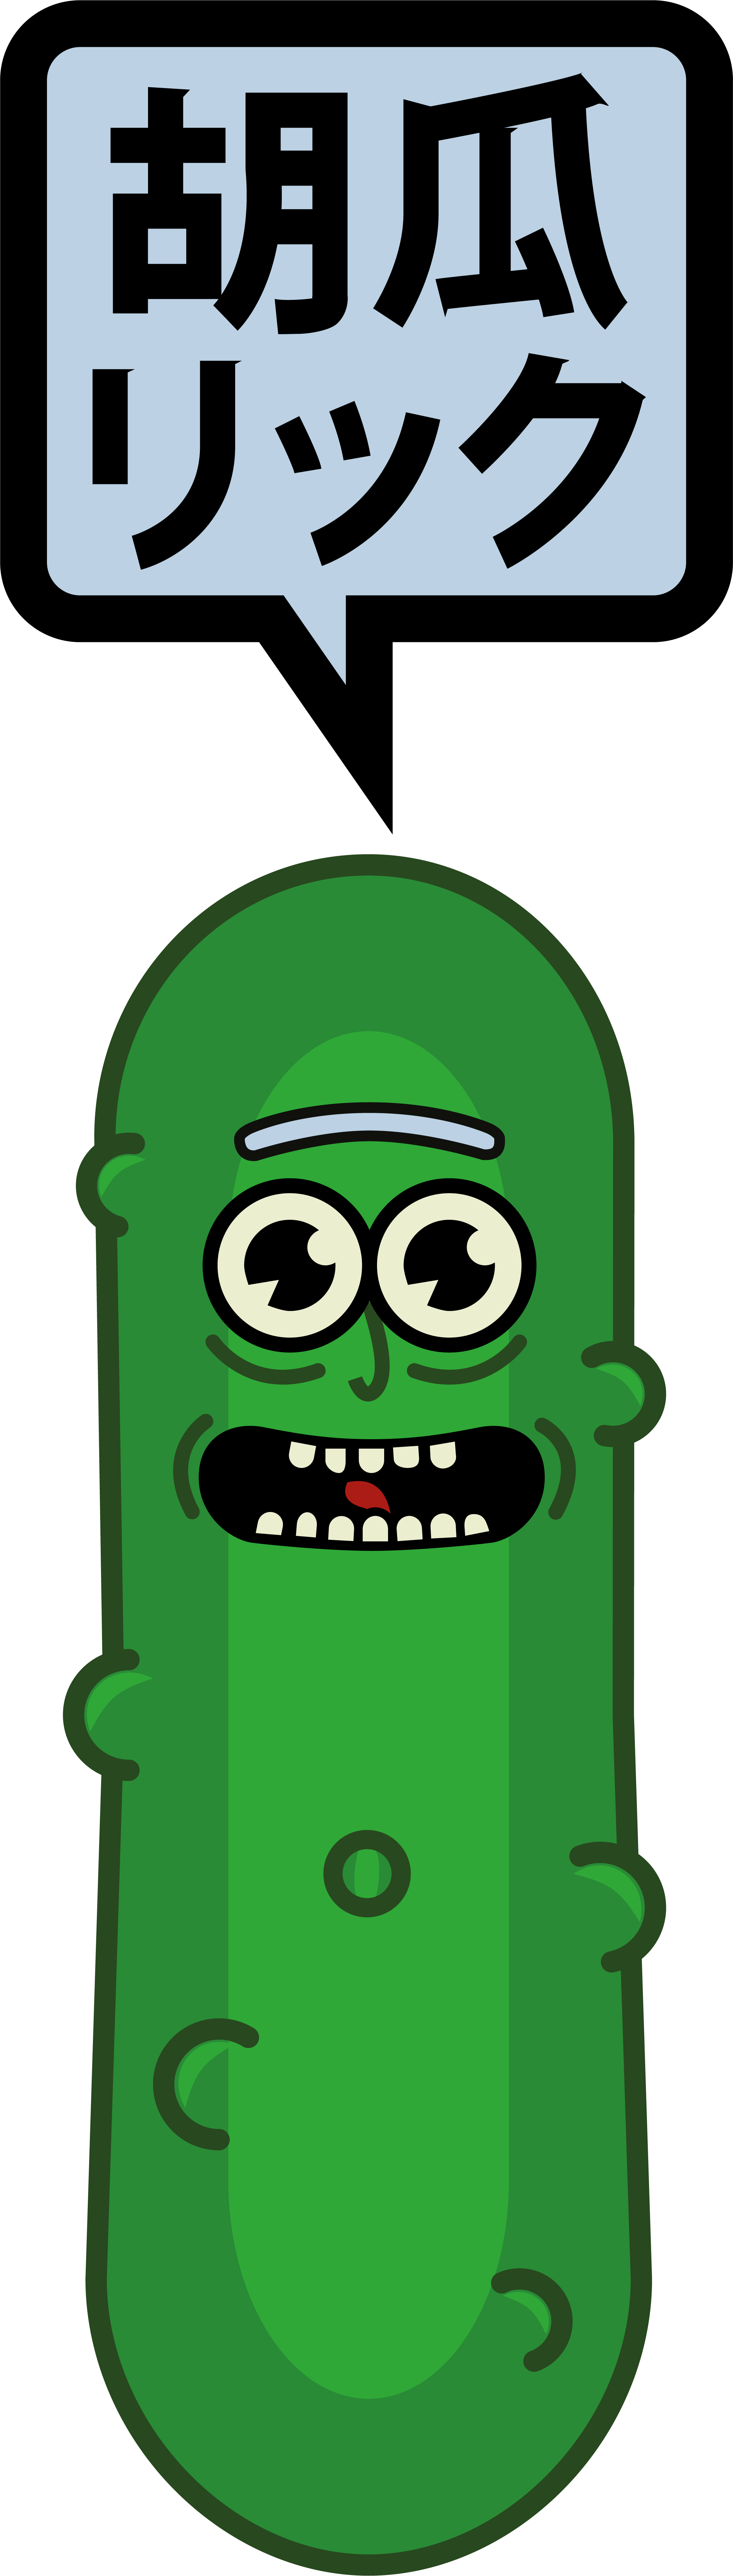 Pickuru Ricku